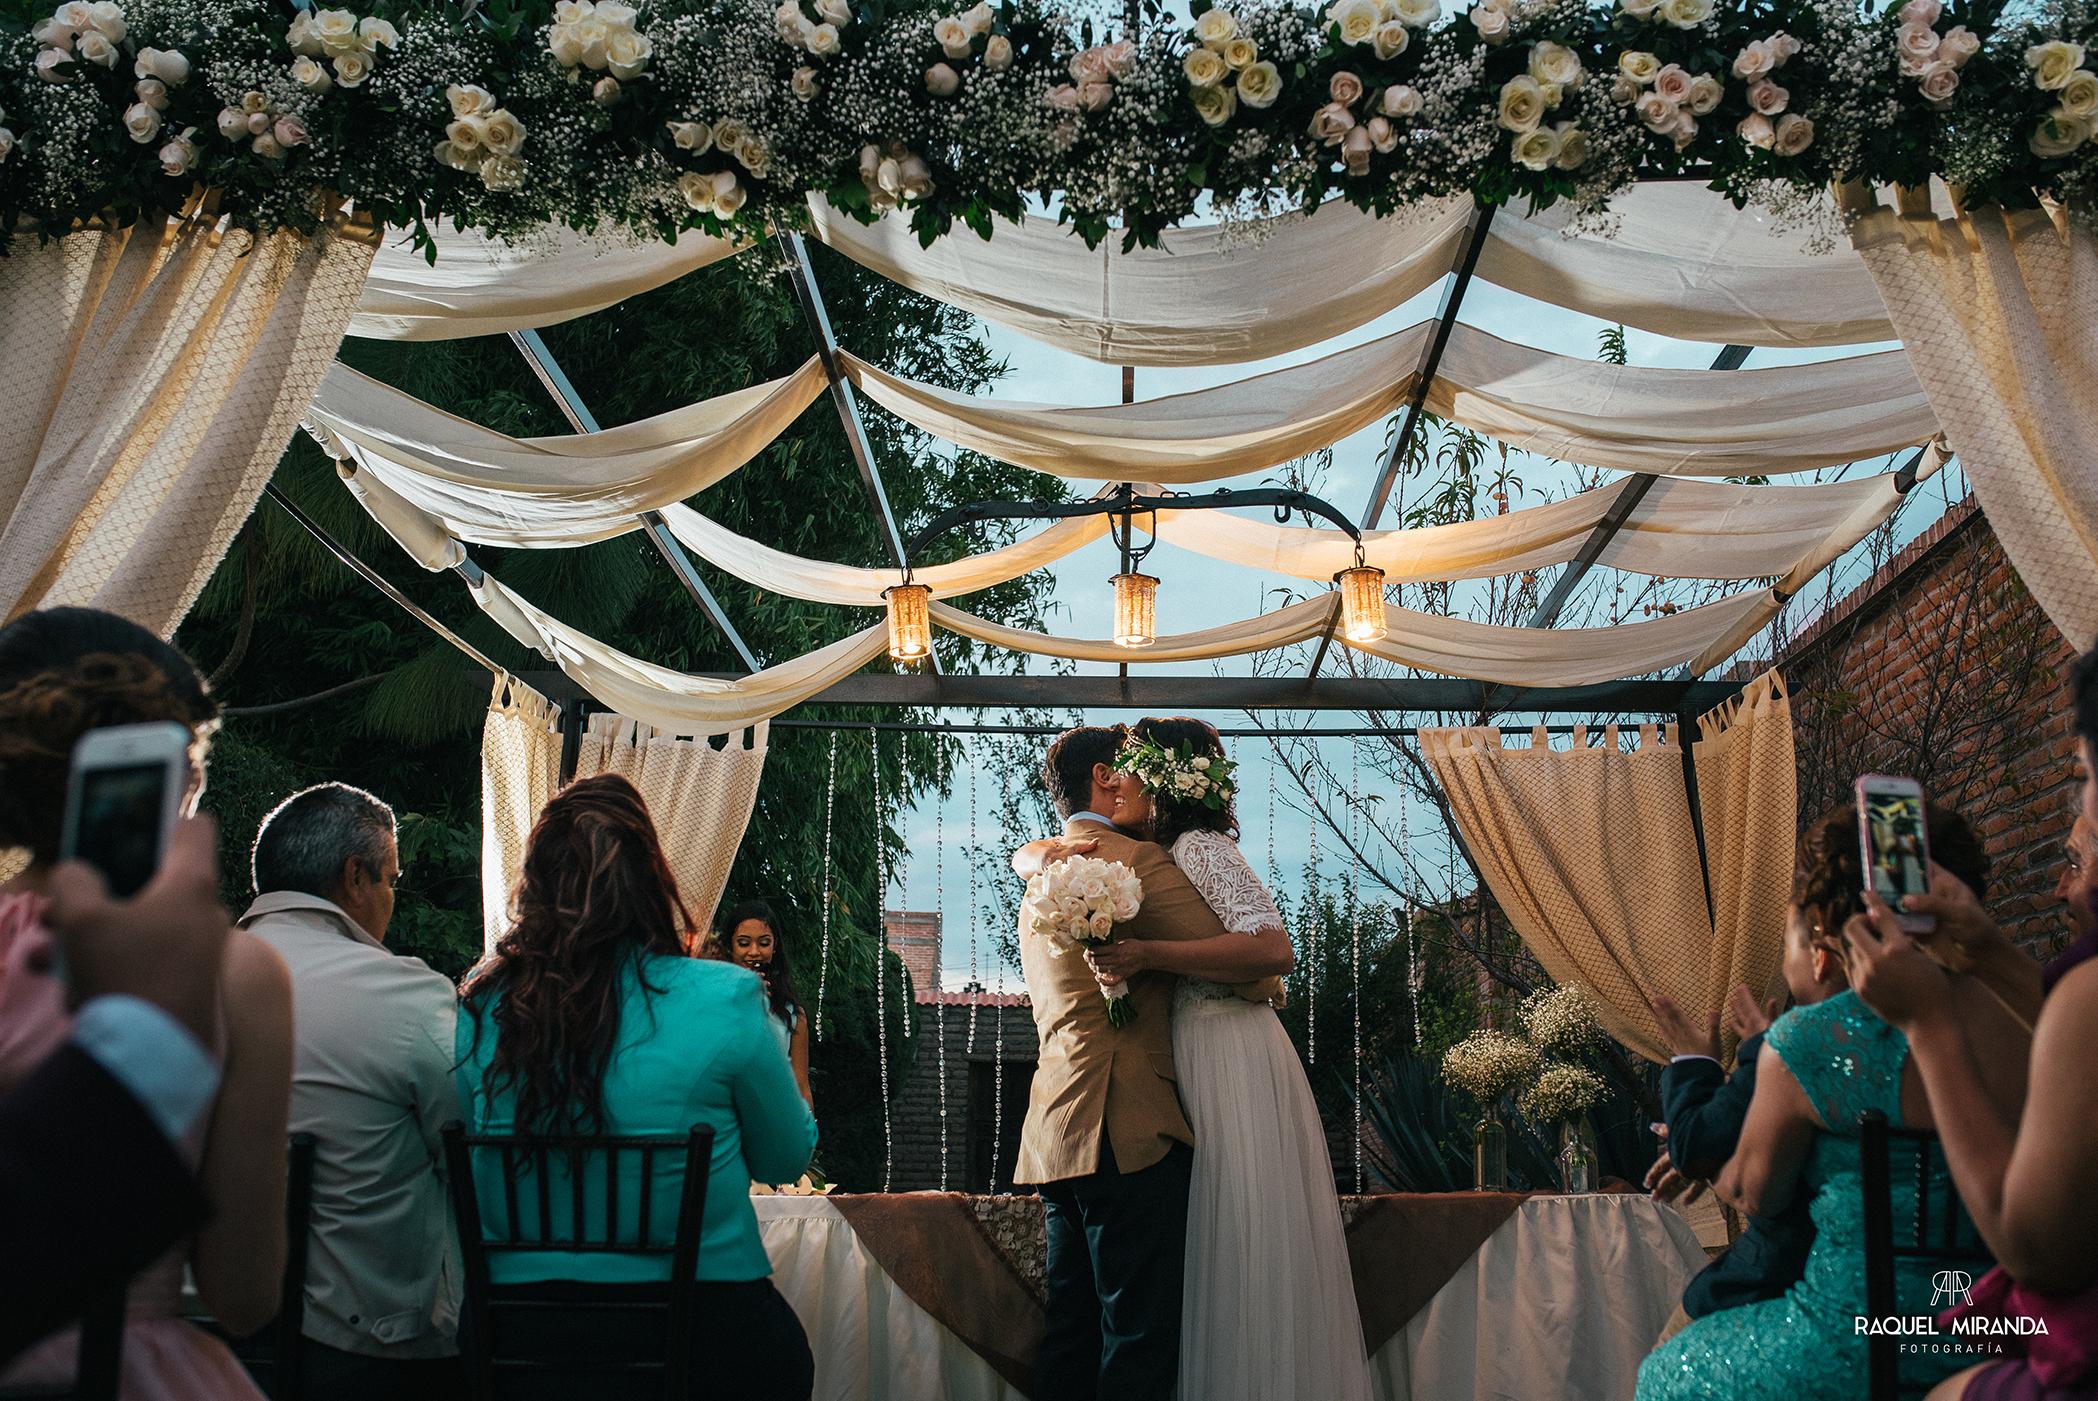 raquel miranda fotografía | boda civil| paulina&benjamin-13.jpg